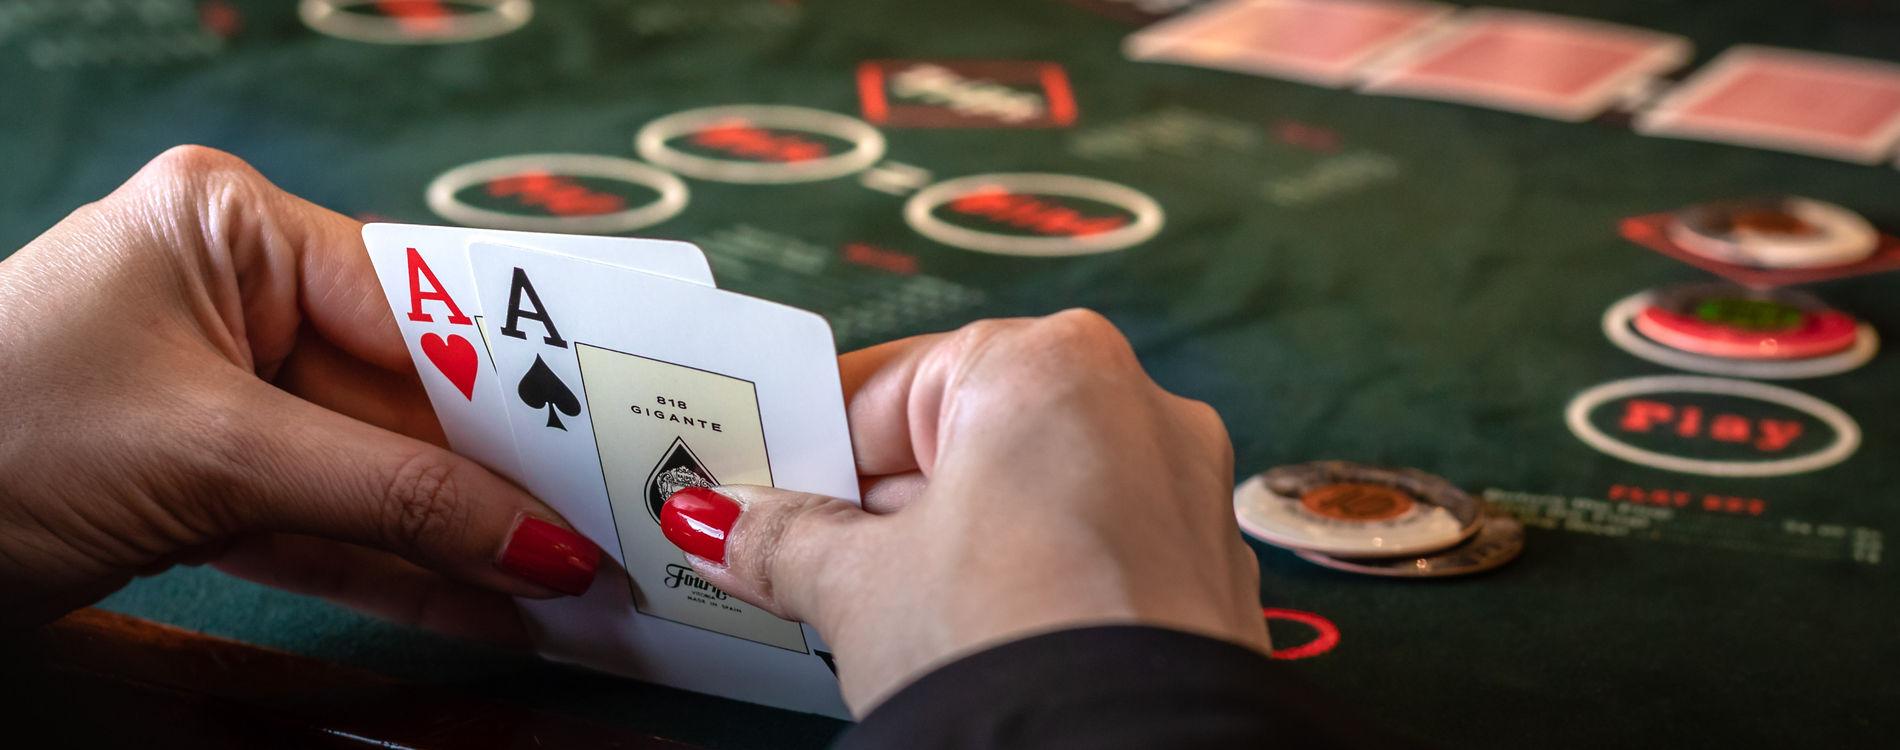 make a casino deposit